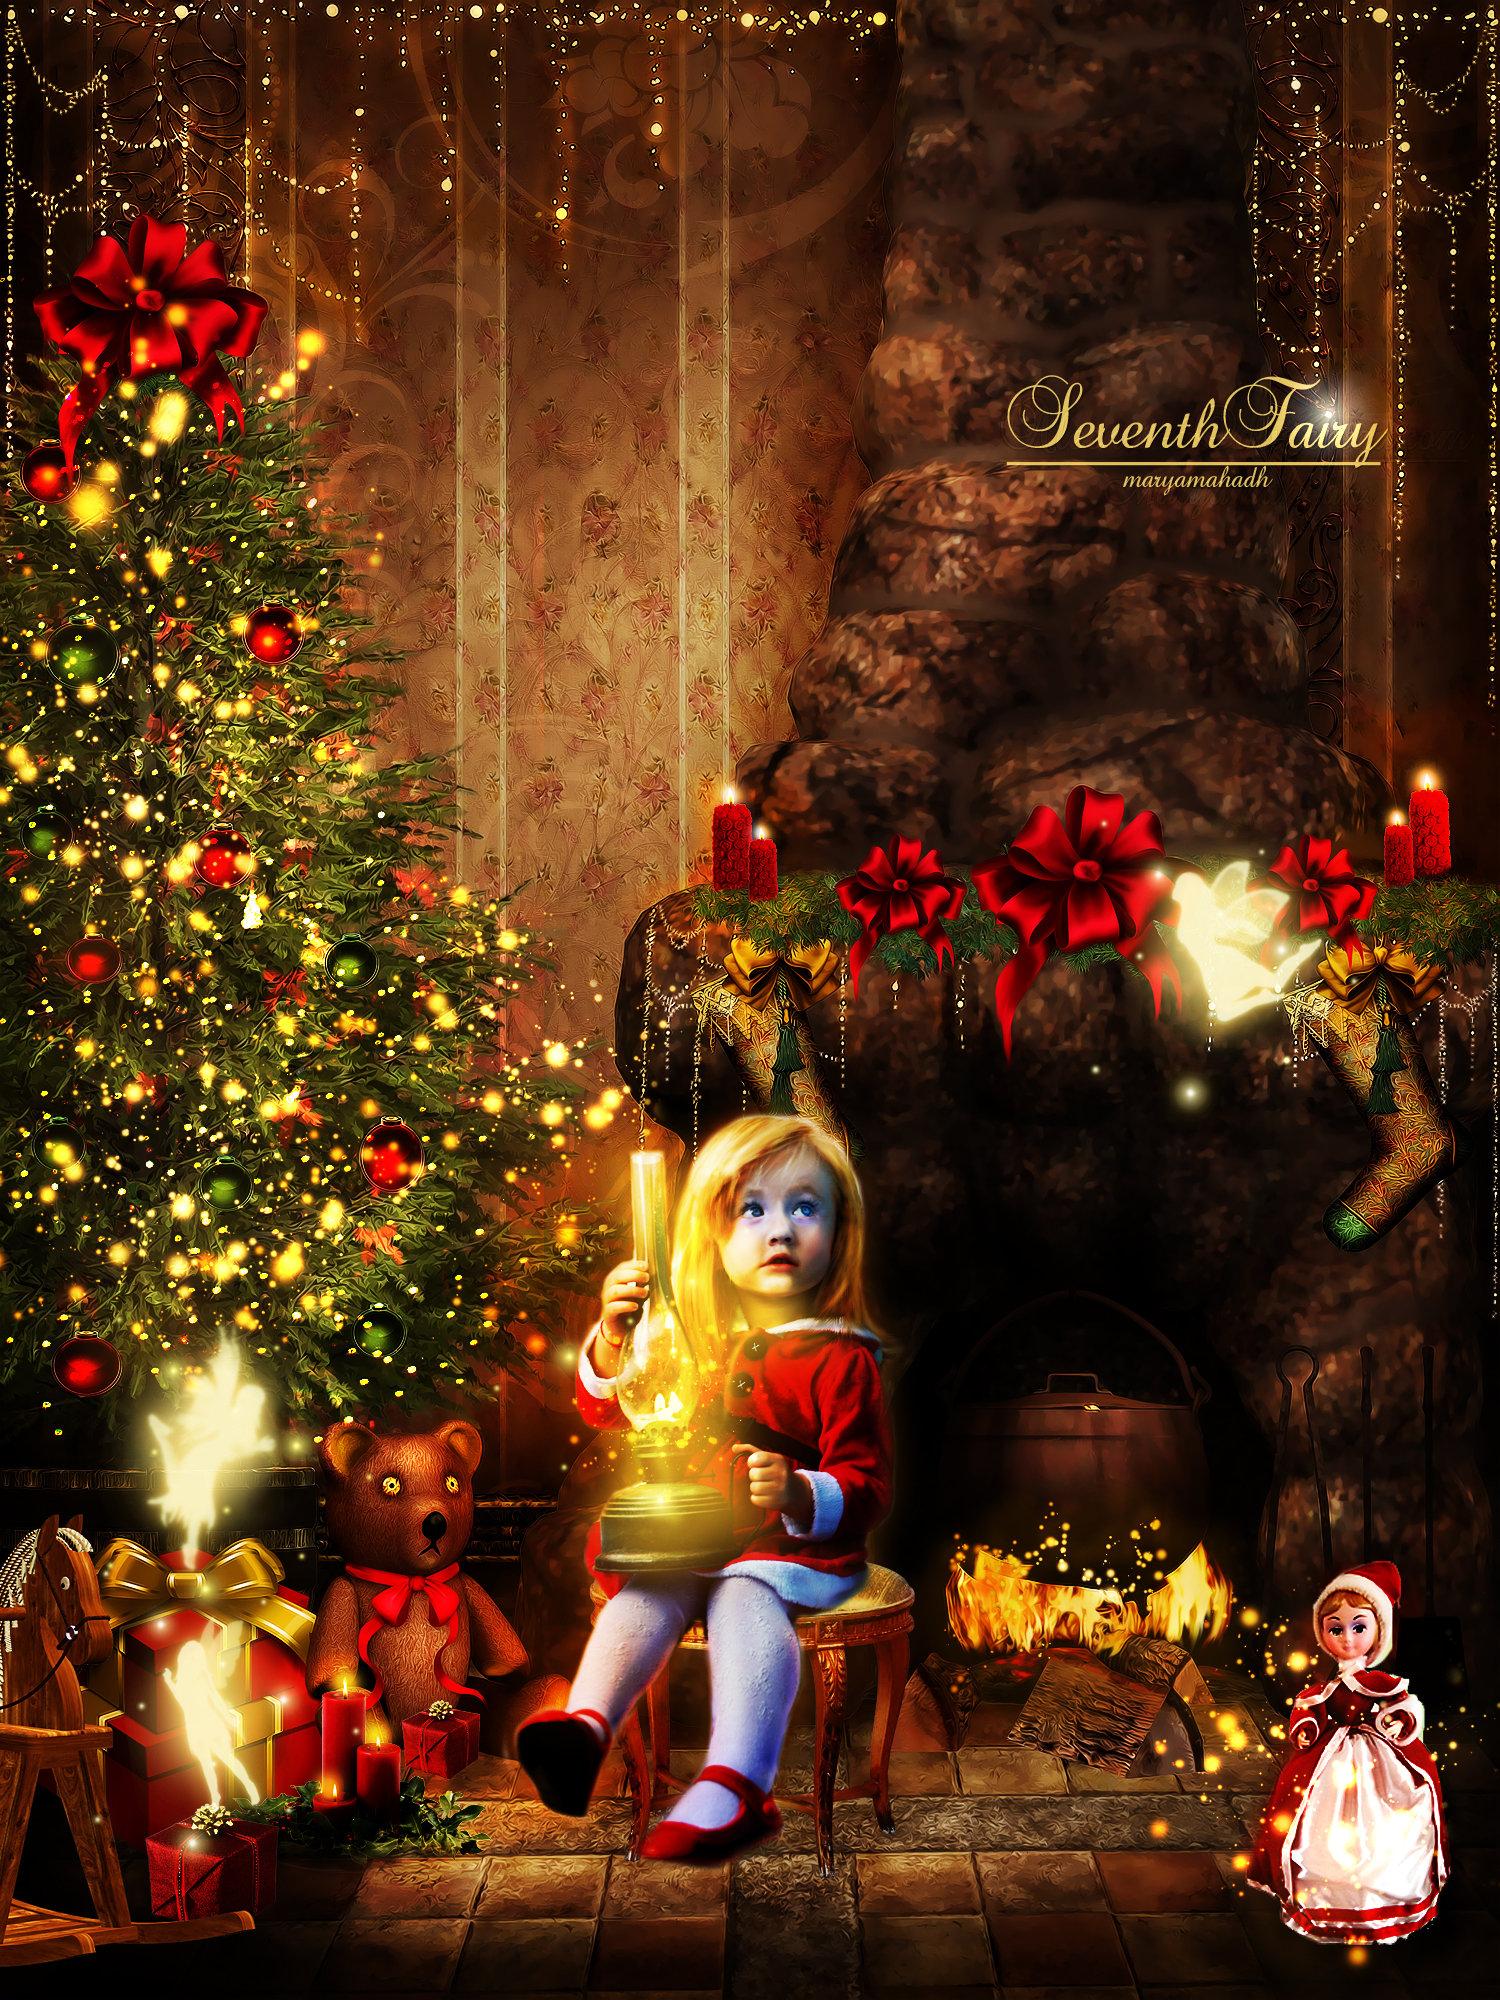 Fairy Christmas by SeventhFairy on DeviantArt